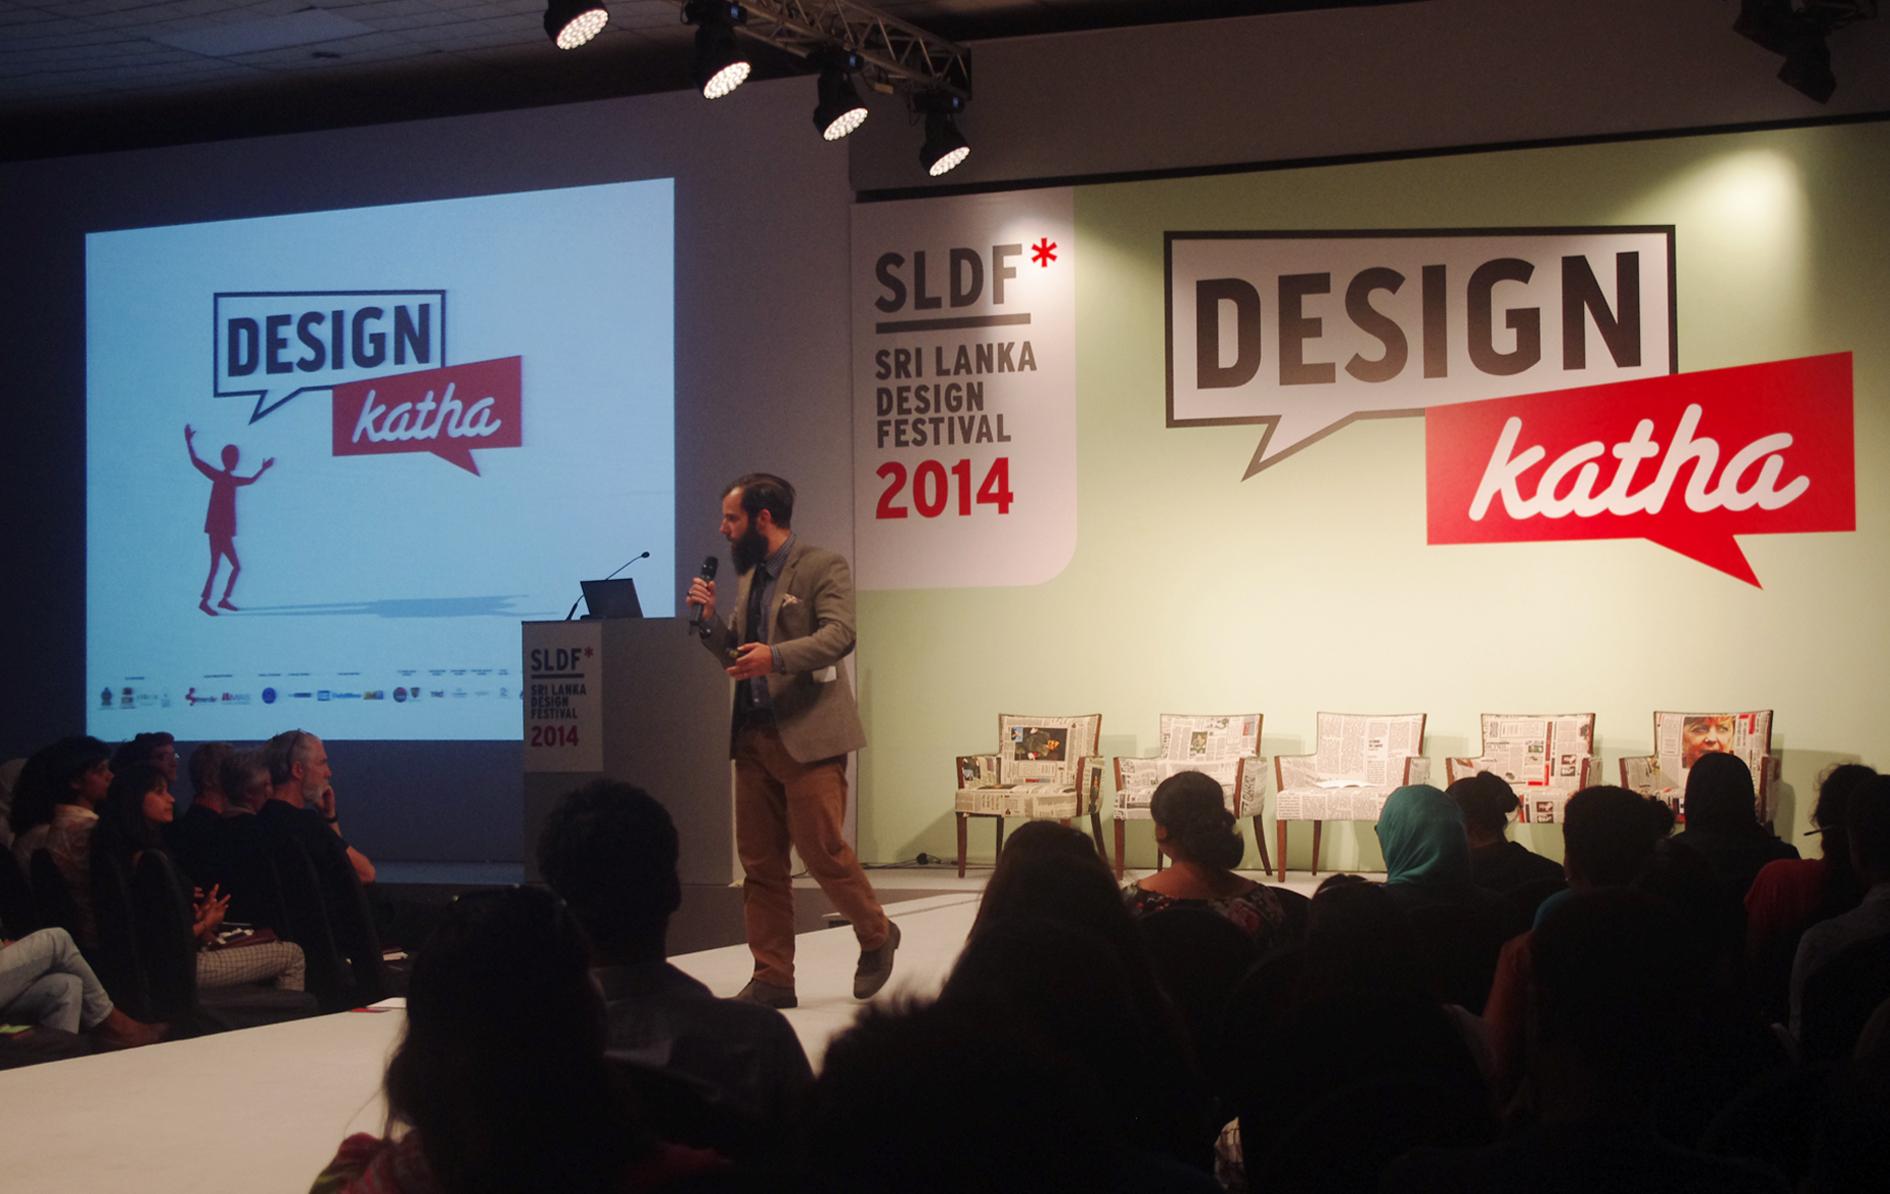 Design Katha forum at SLECC, Colombo. 2014.